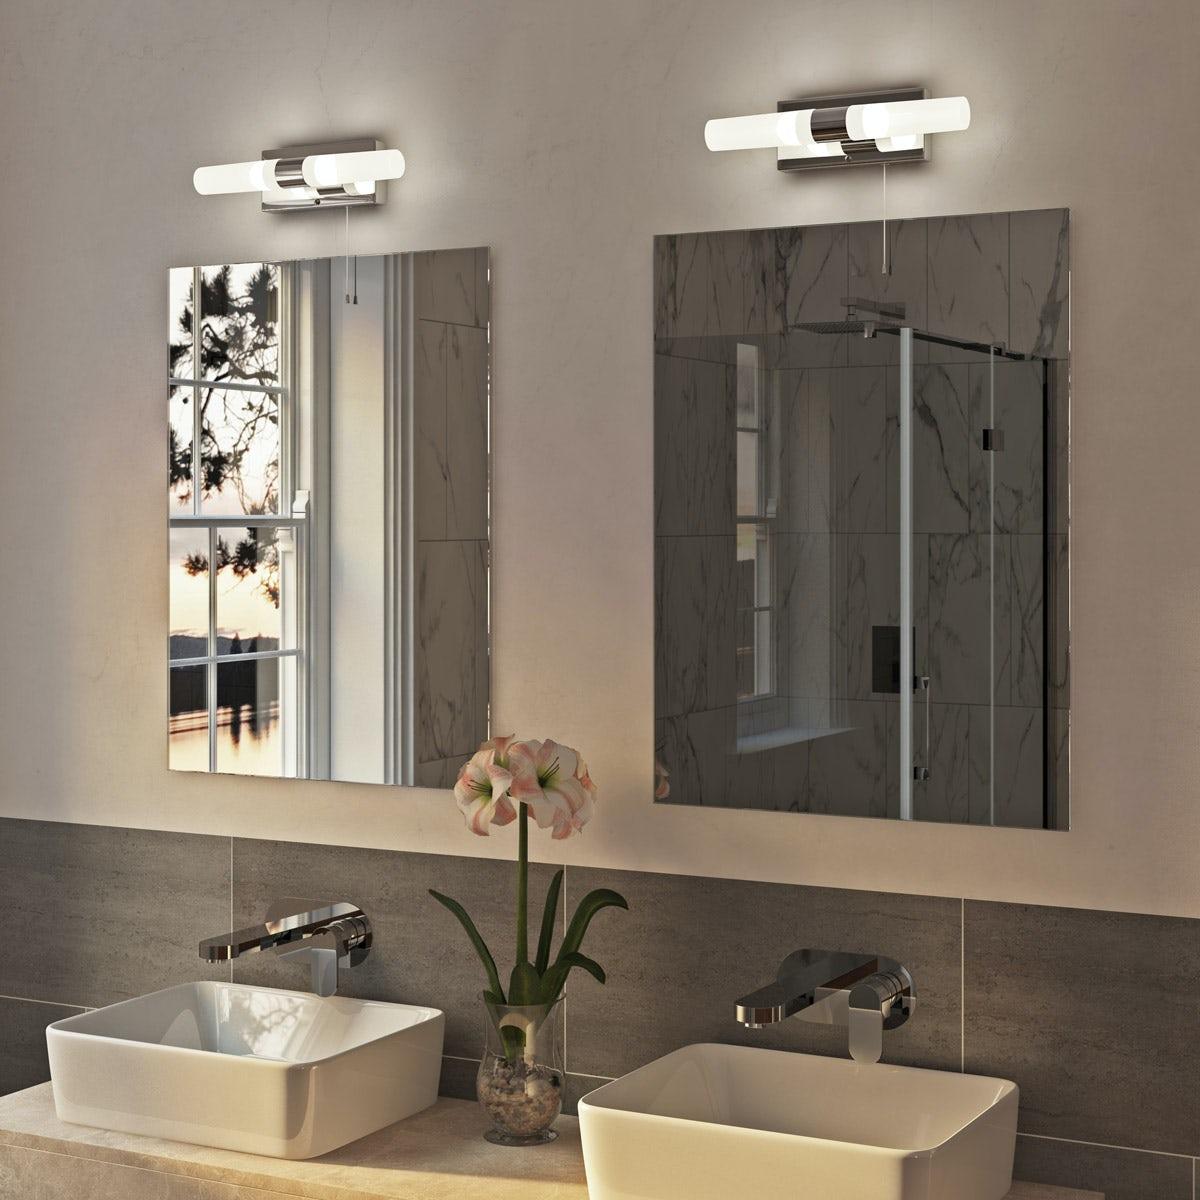 Arinna 2 Light Over Mirror Bathroom